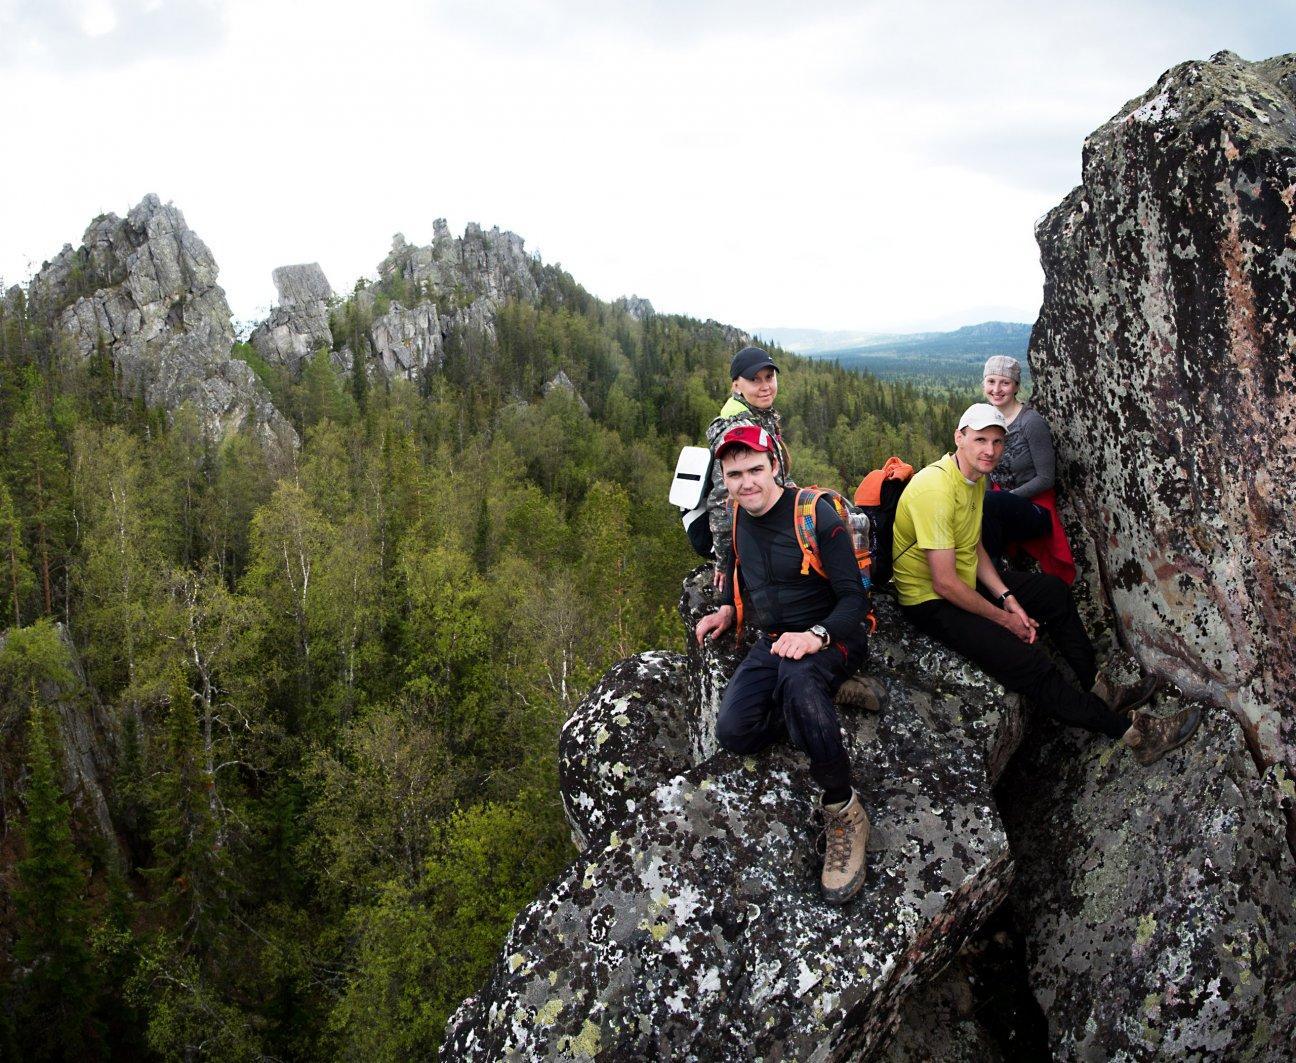 Сидим на краю обрыва на высокой скале